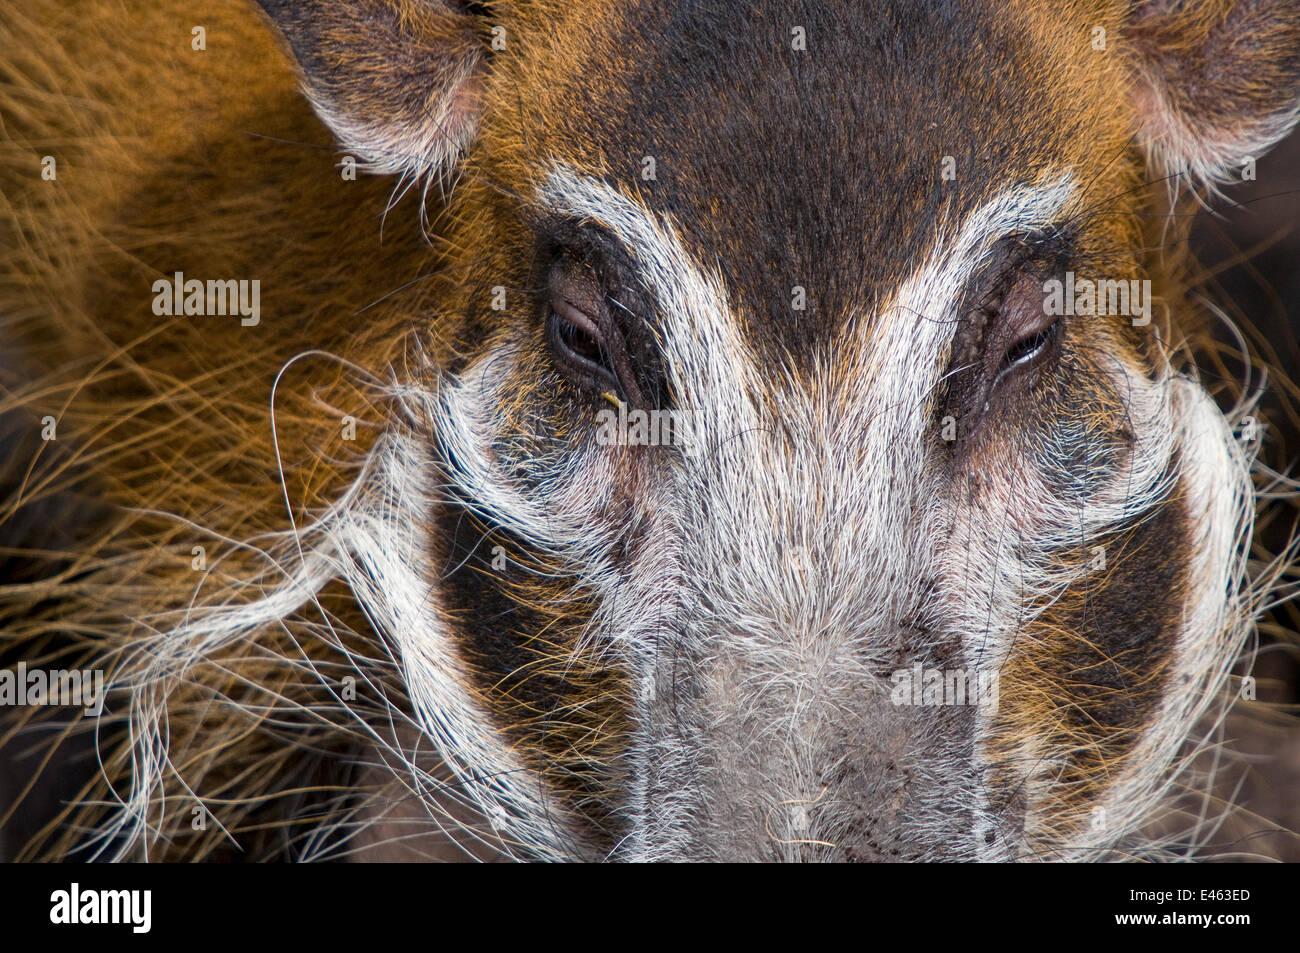 Red River Hog (Potamochoerus Porcus) Nahaufnahme des Kopfes, gefangen Stockbild